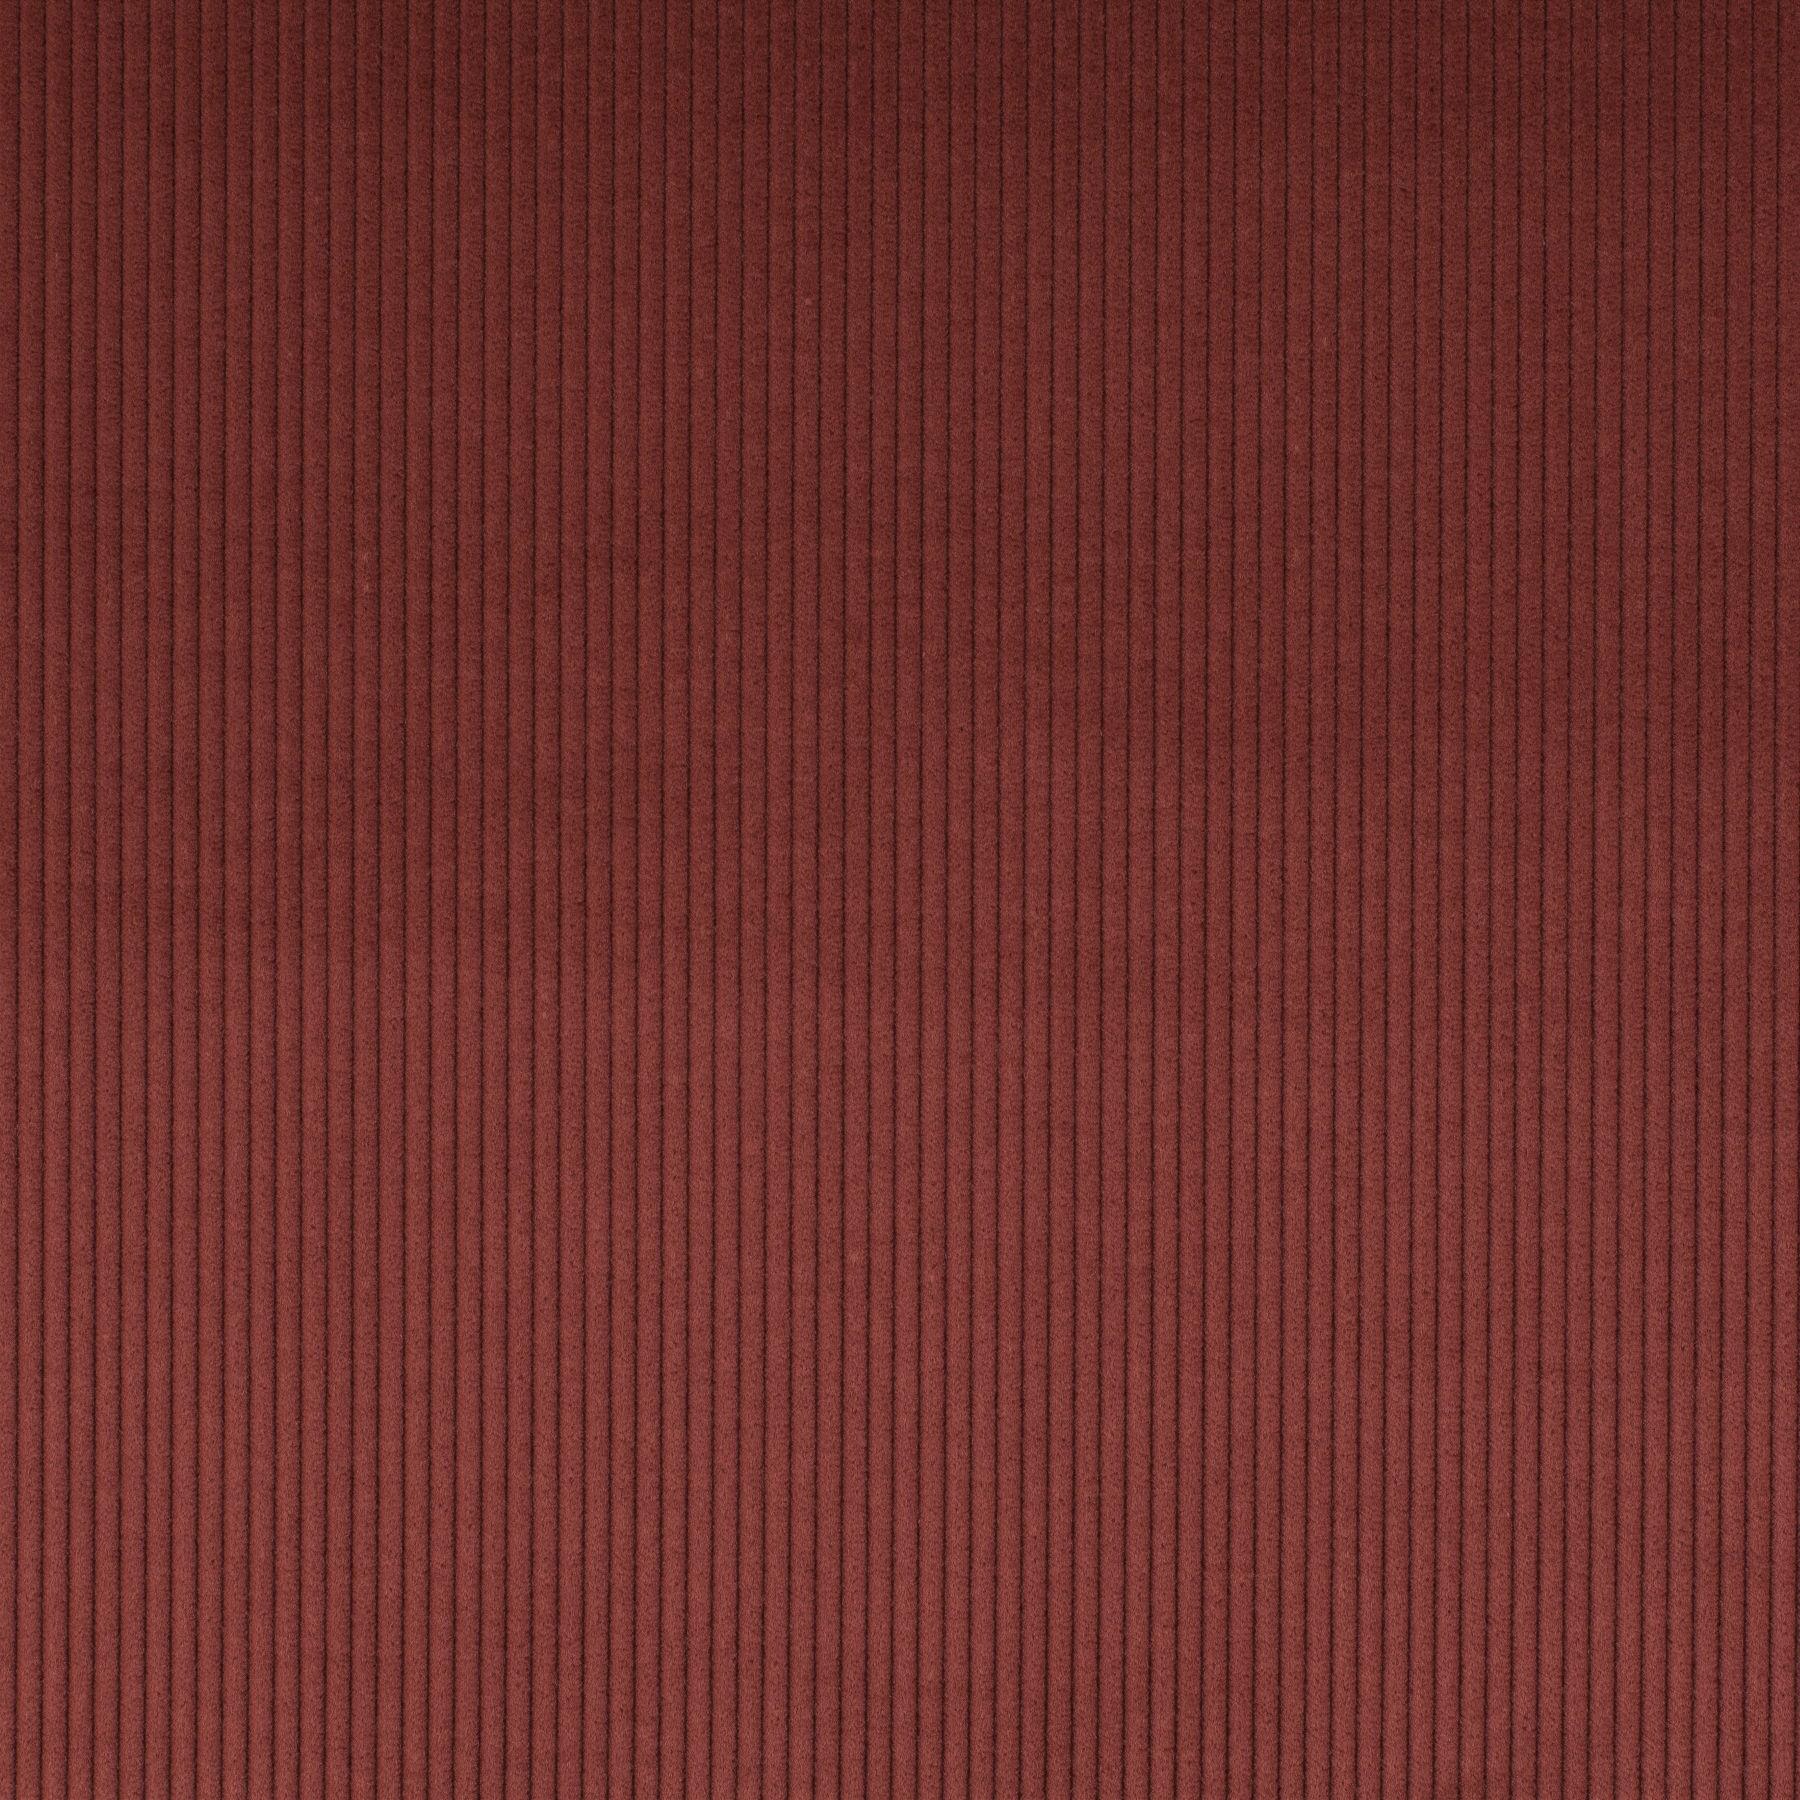 upholstery fabric cord 1 3126 012 jab anstoetz fabrics. Black Bedroom Furniture Sets. Home Design Ideas